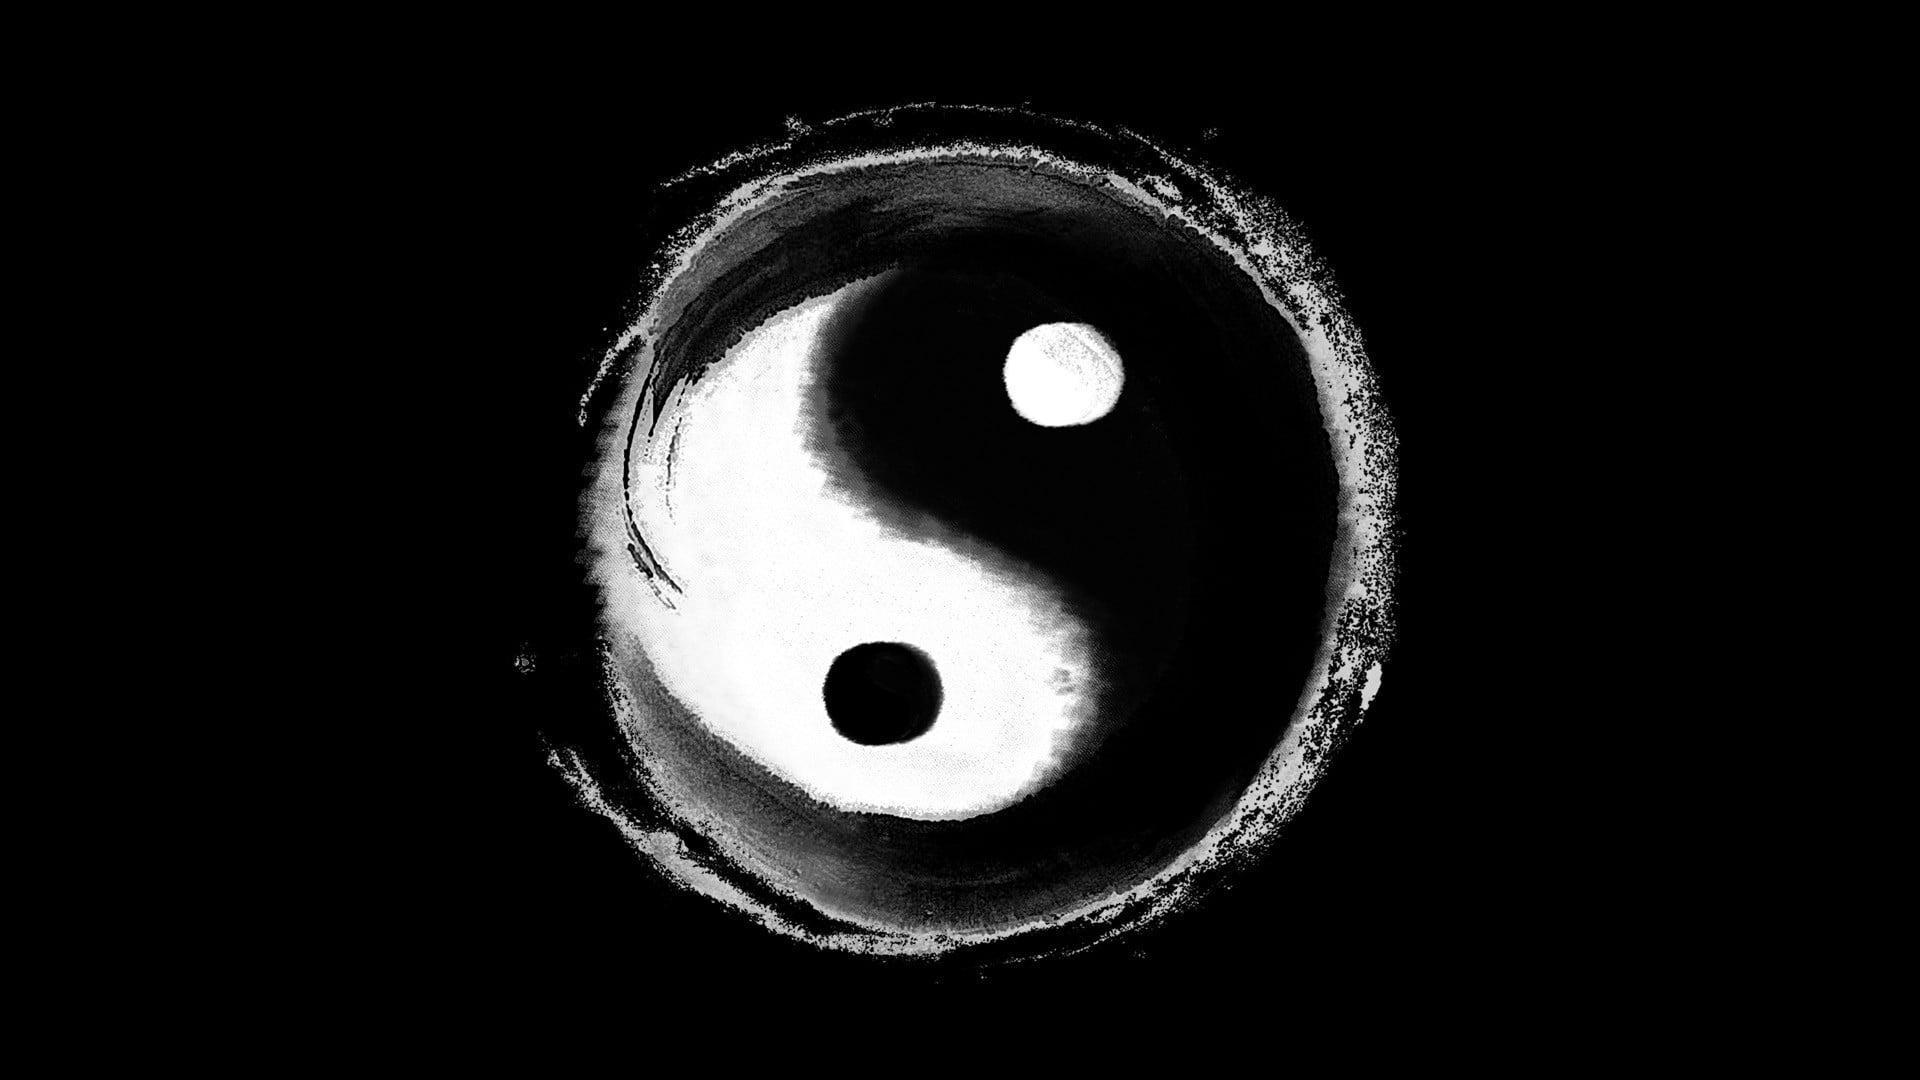 Yin And Yang Wallpapers Top Free Yin And Yang Backgrounds